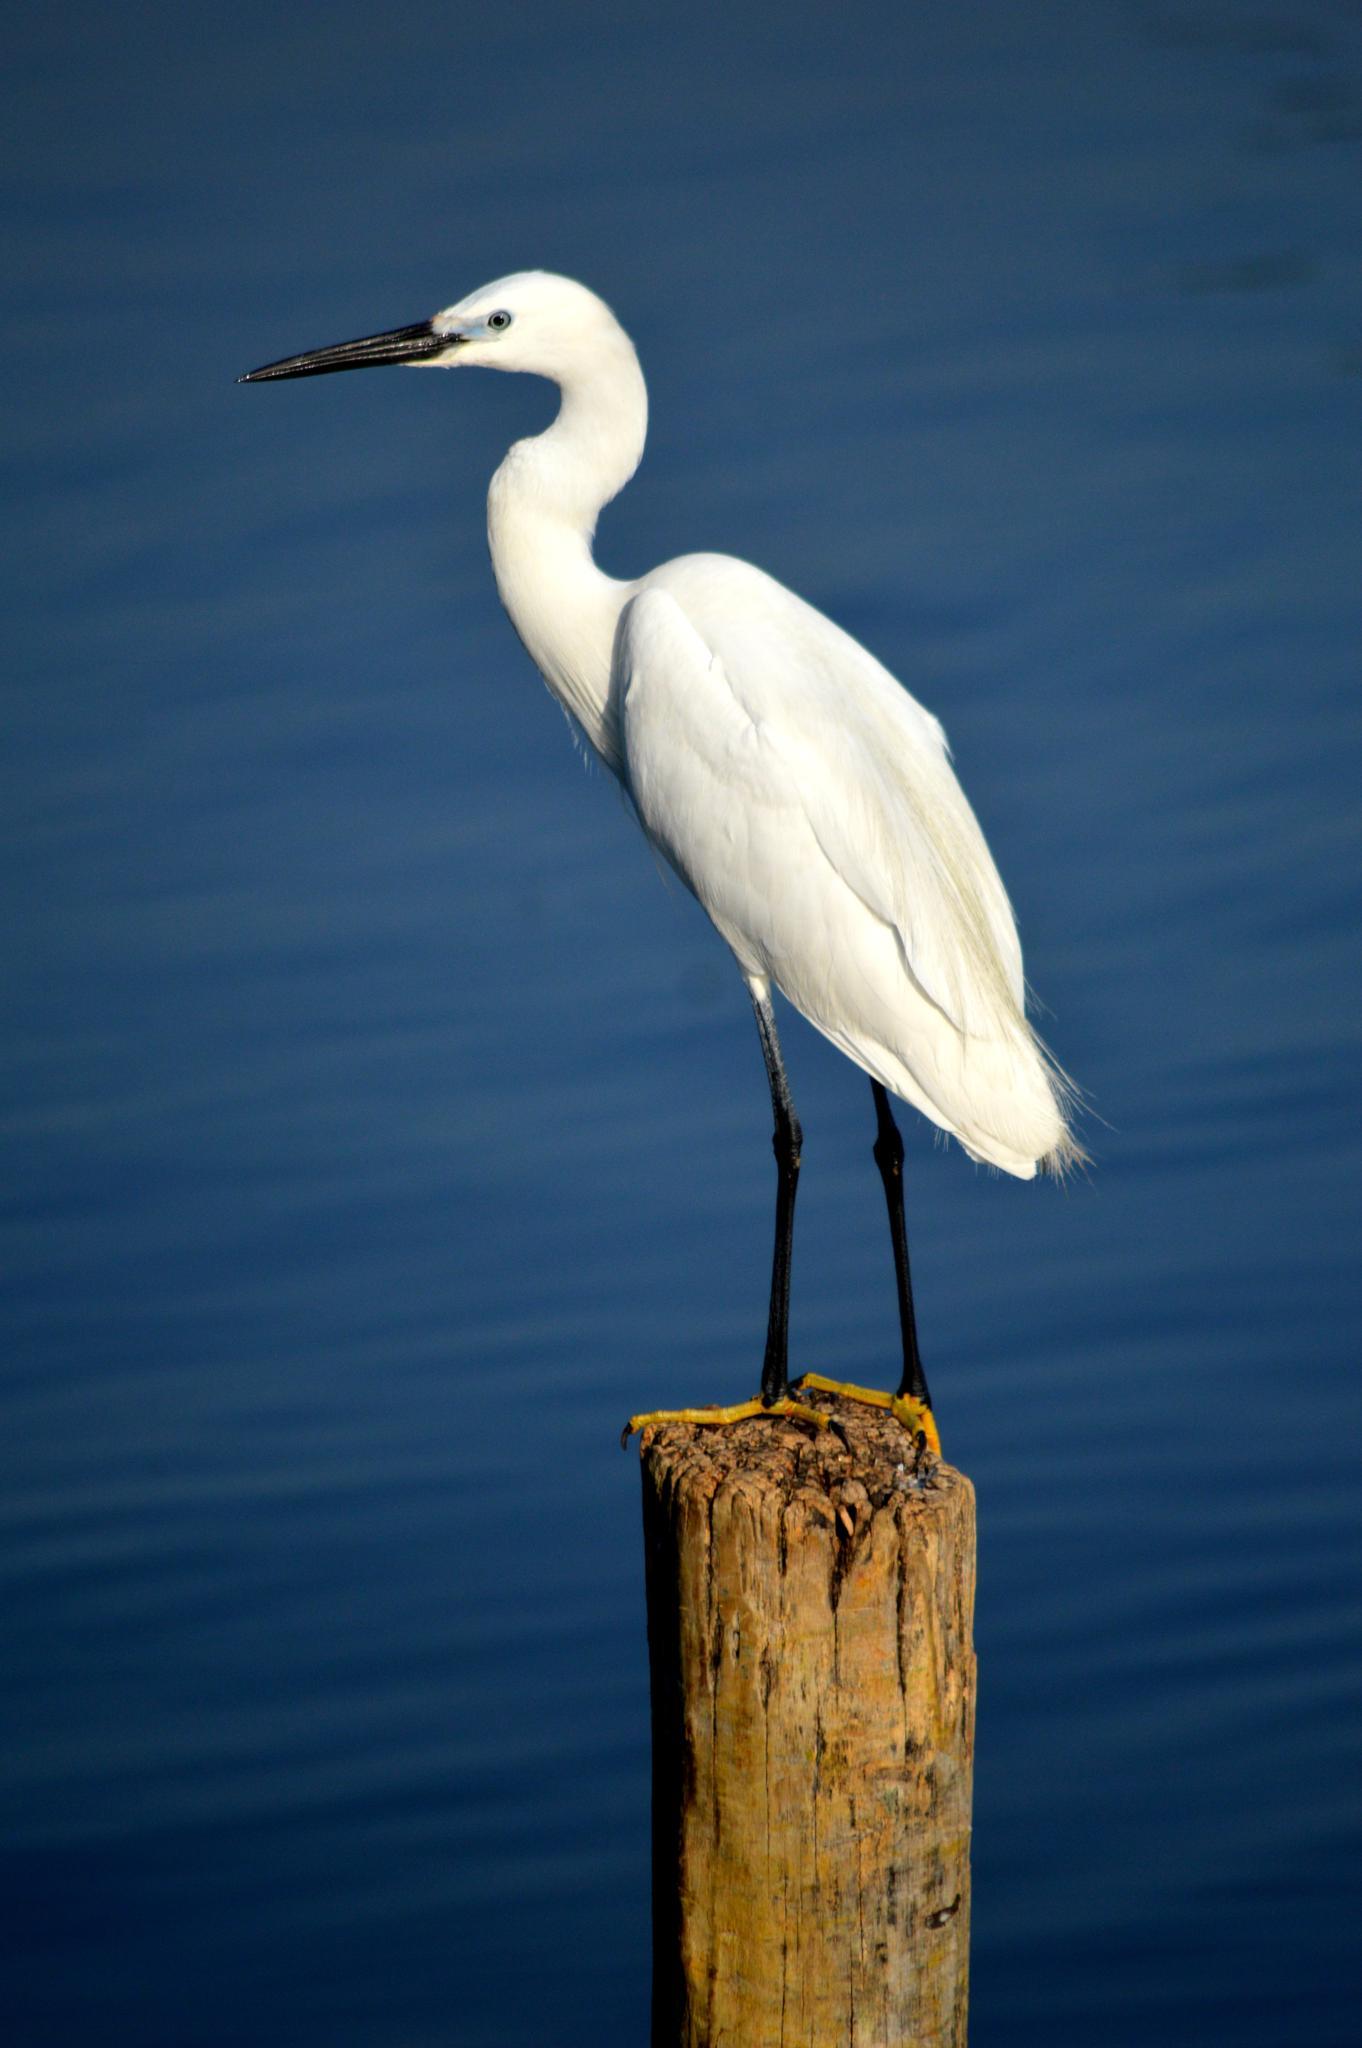 Egret by Aadil Hayat Bhat